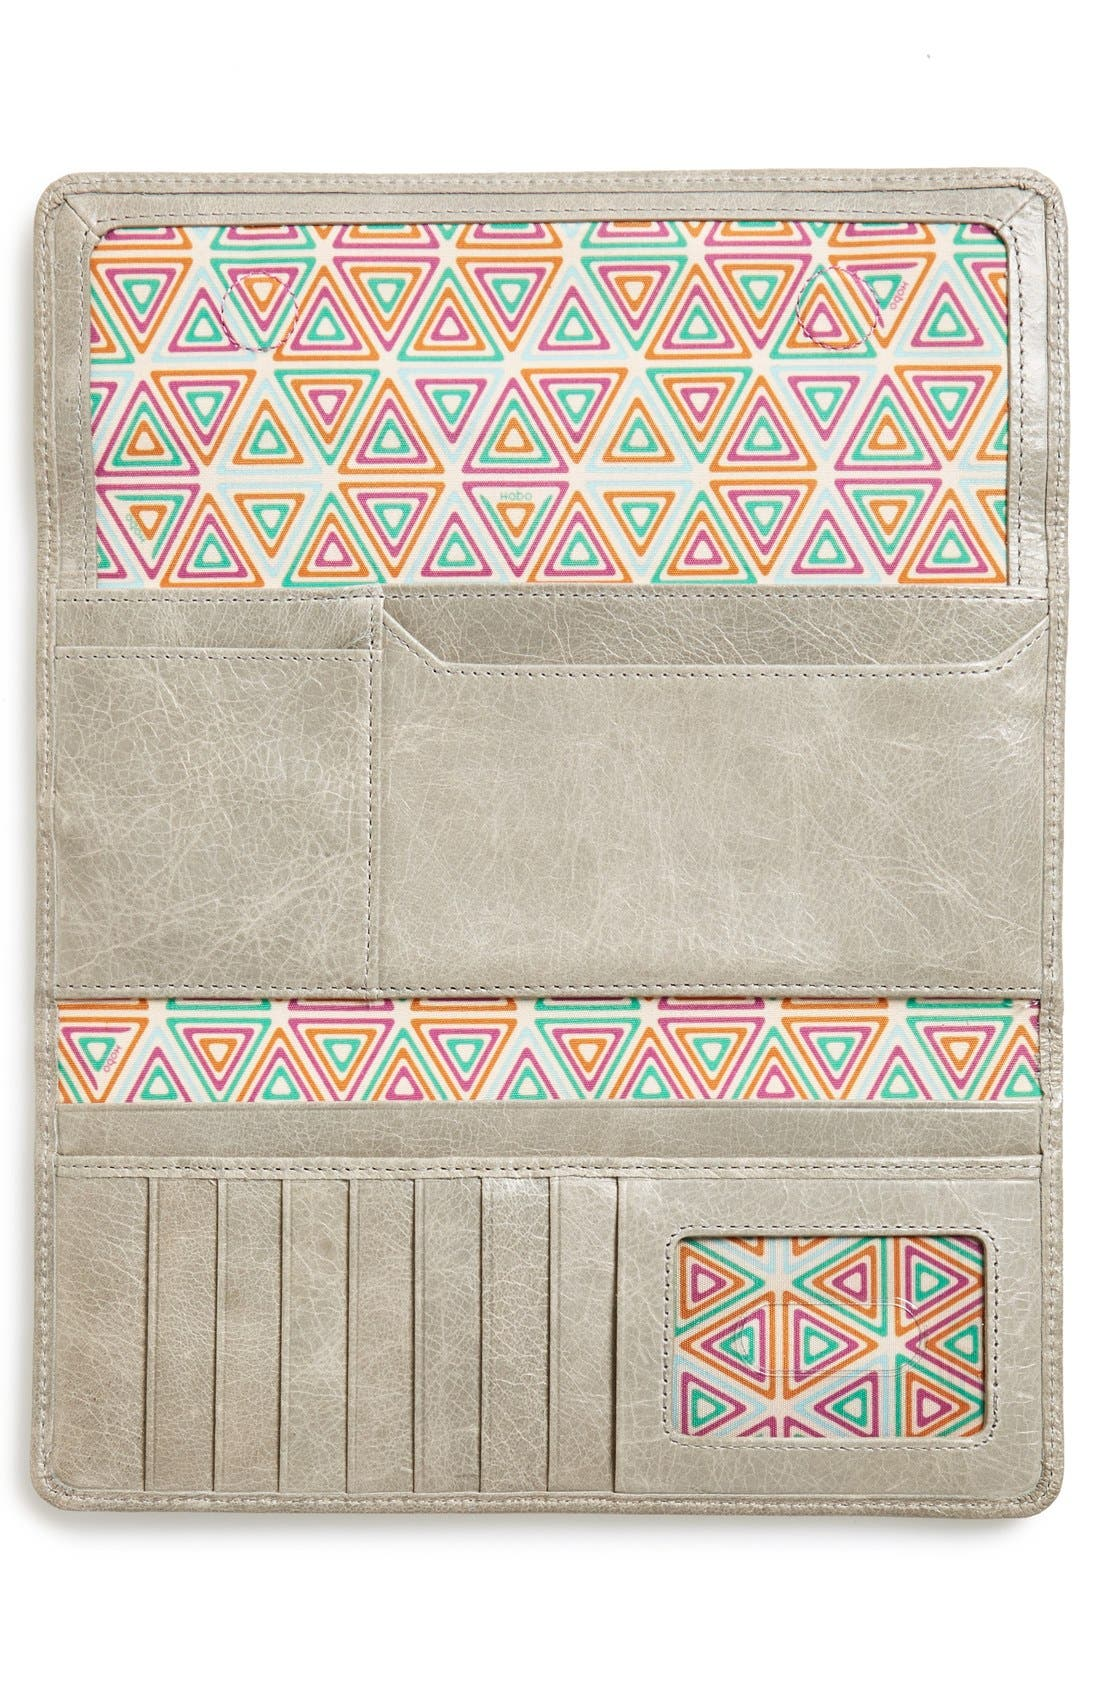 'Sadie' Leather Wallet,                             Alternate thumbnail 178, color,